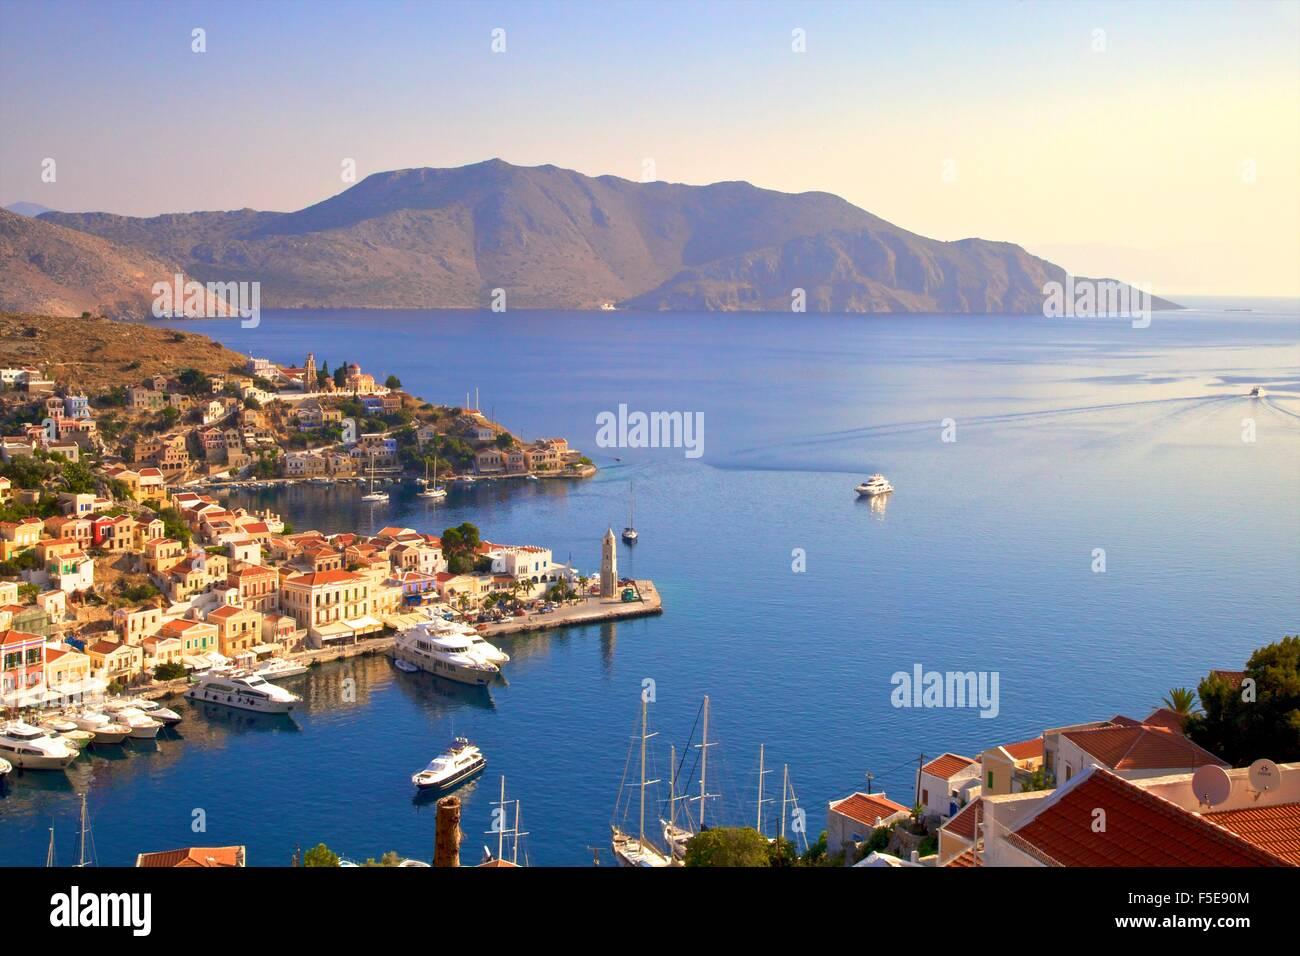 Symi Harbour, Symi, Dodecanese, Greek Islands, Greece, Europe - Stock Image